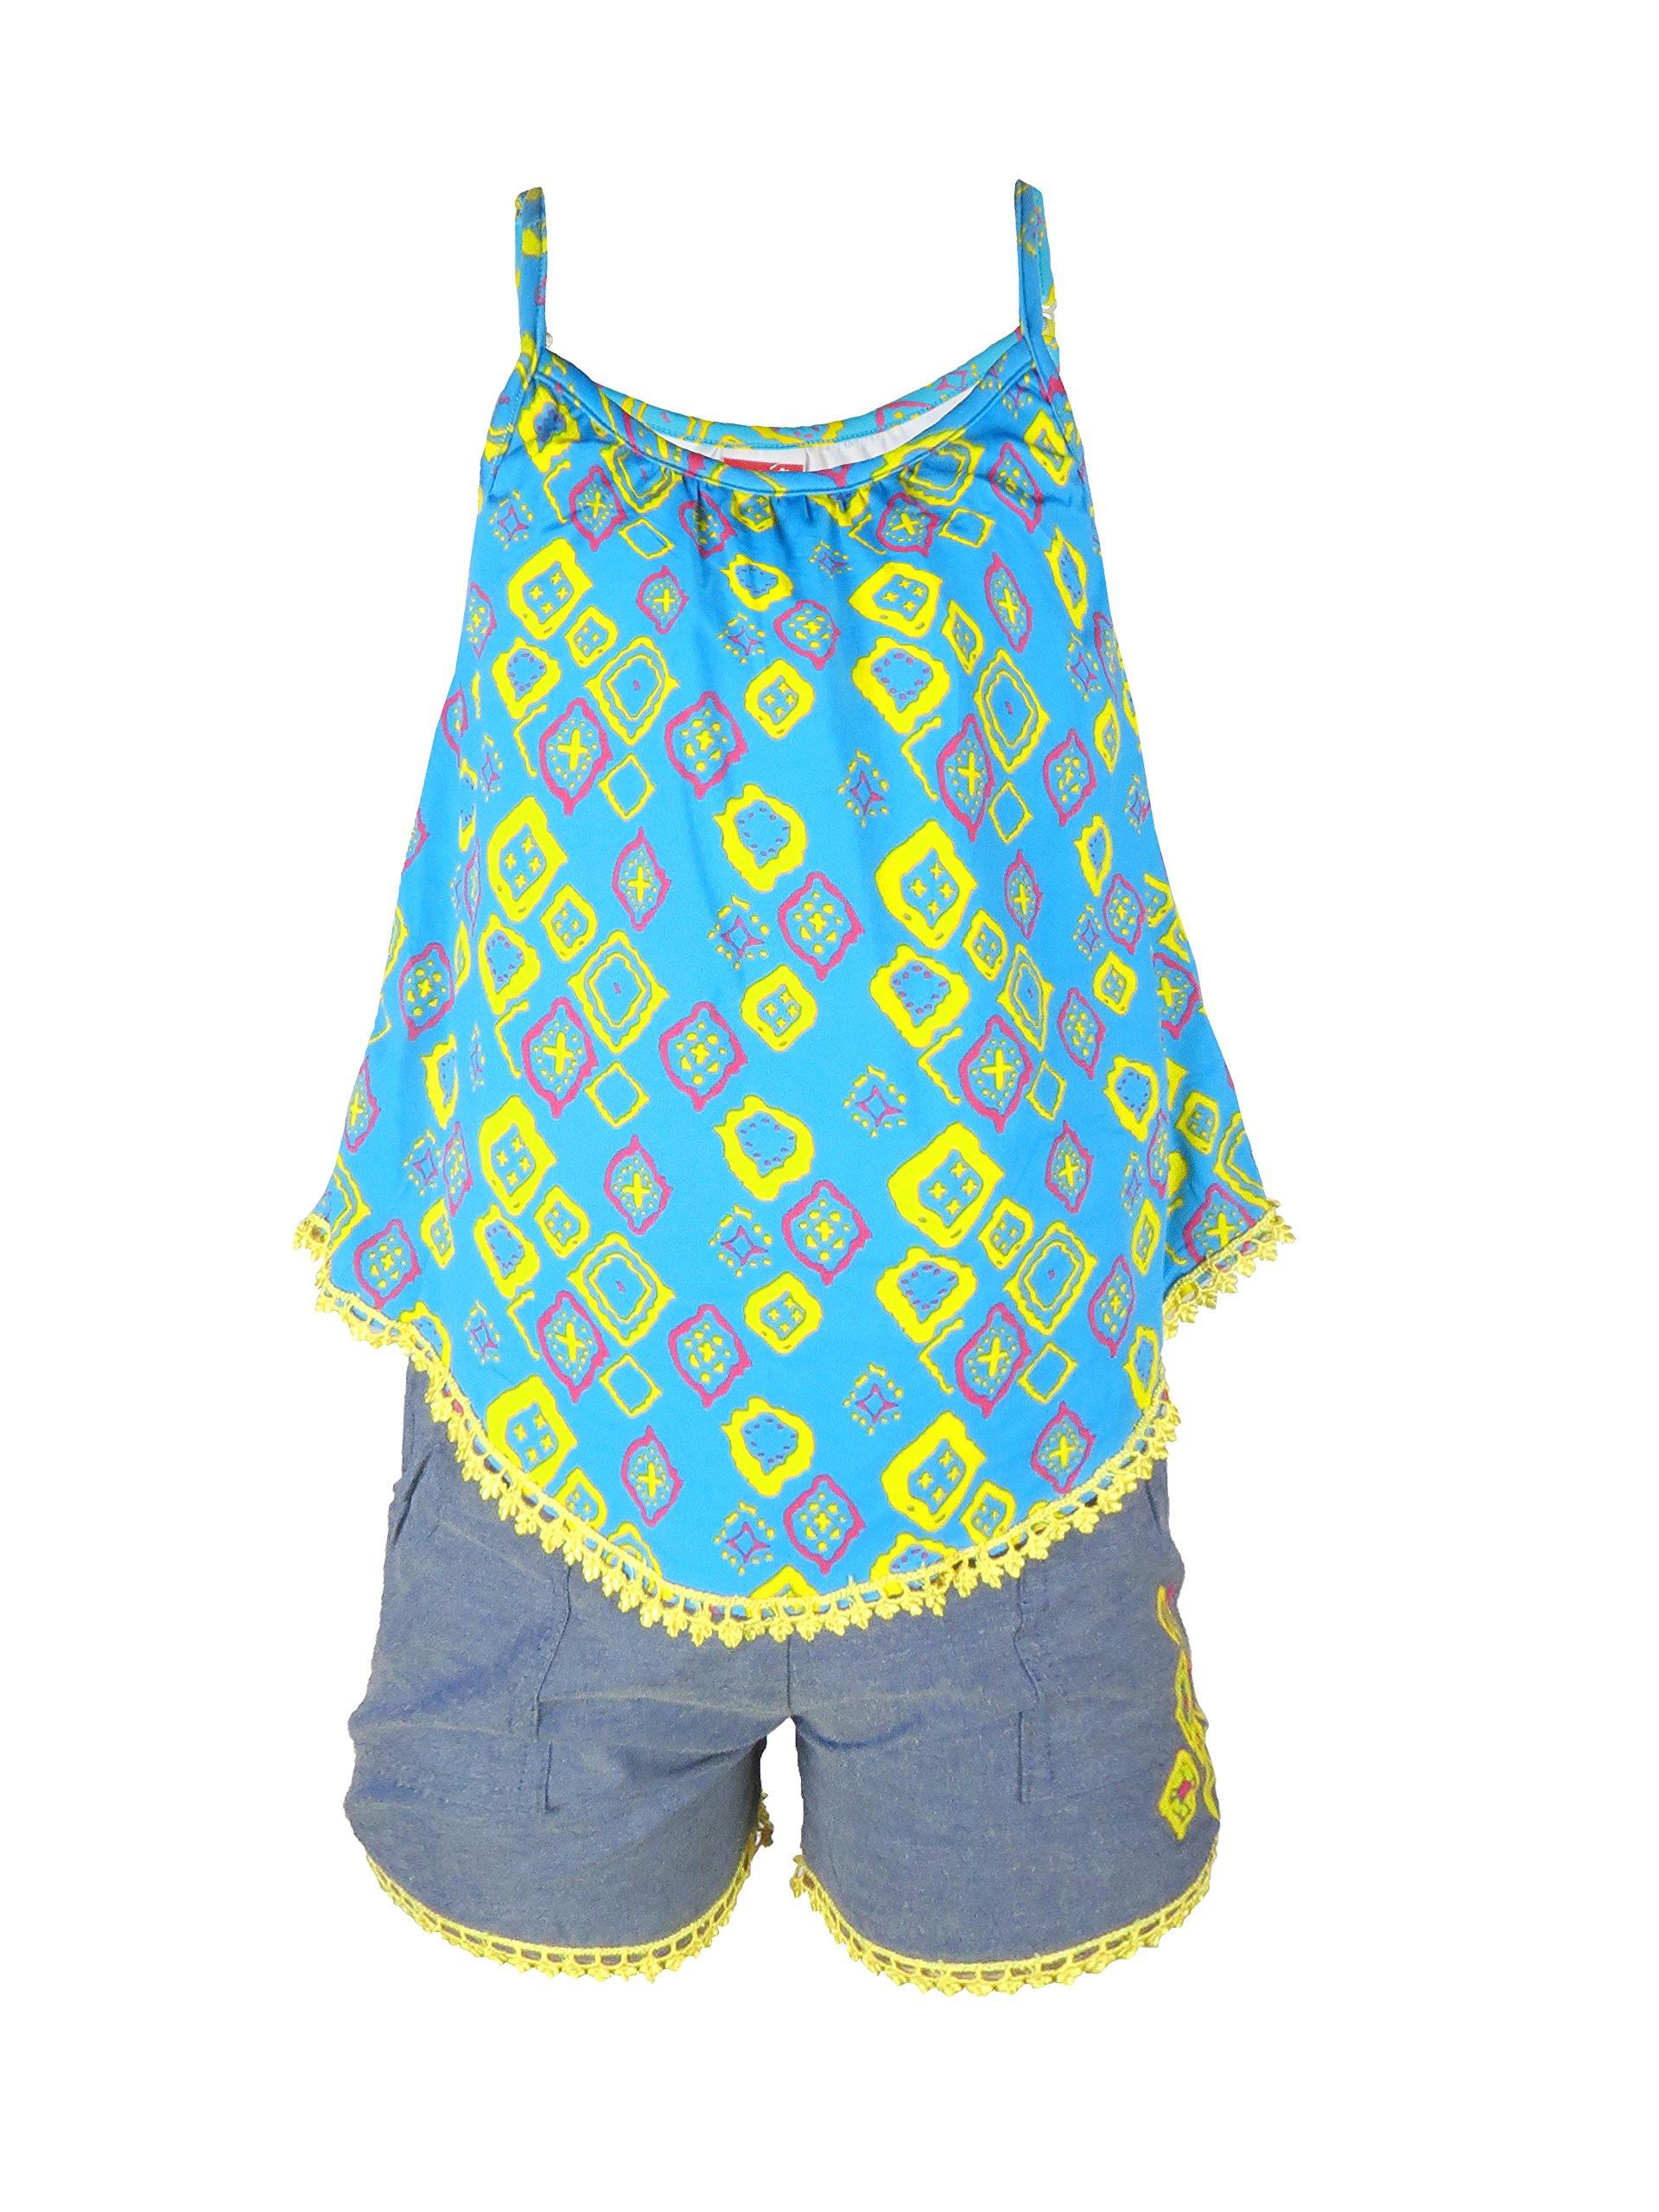 Crush Girls Printed Romper with Denim Shorts Bottom Turquoise Size 10/12